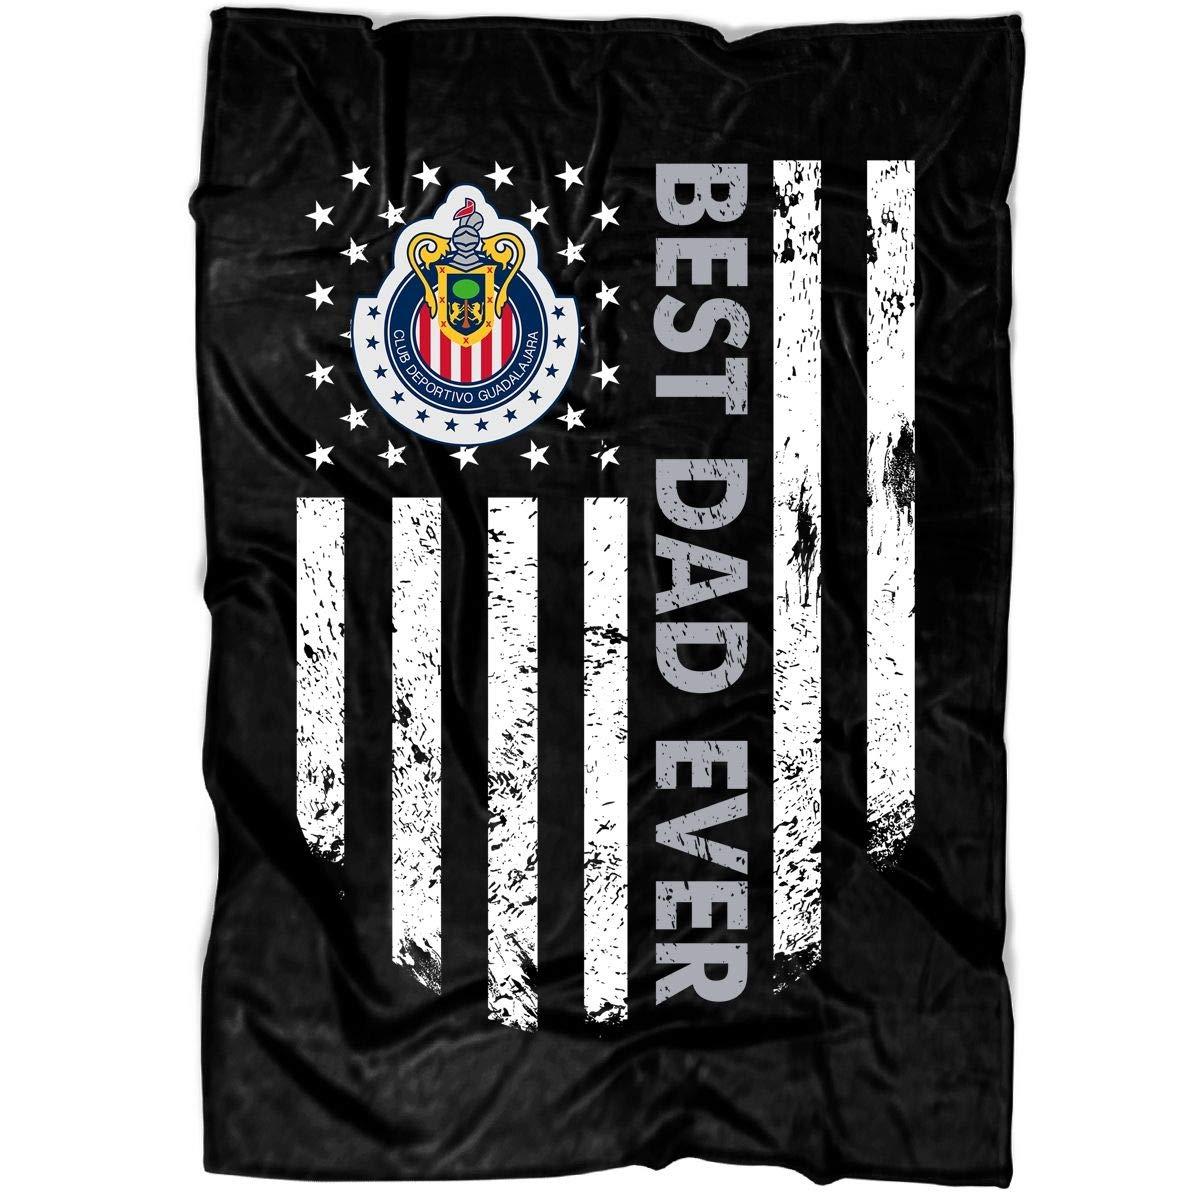 Amazon.com: CNTSTORE Club Deportivo Guadalajara Soft Fleece ...